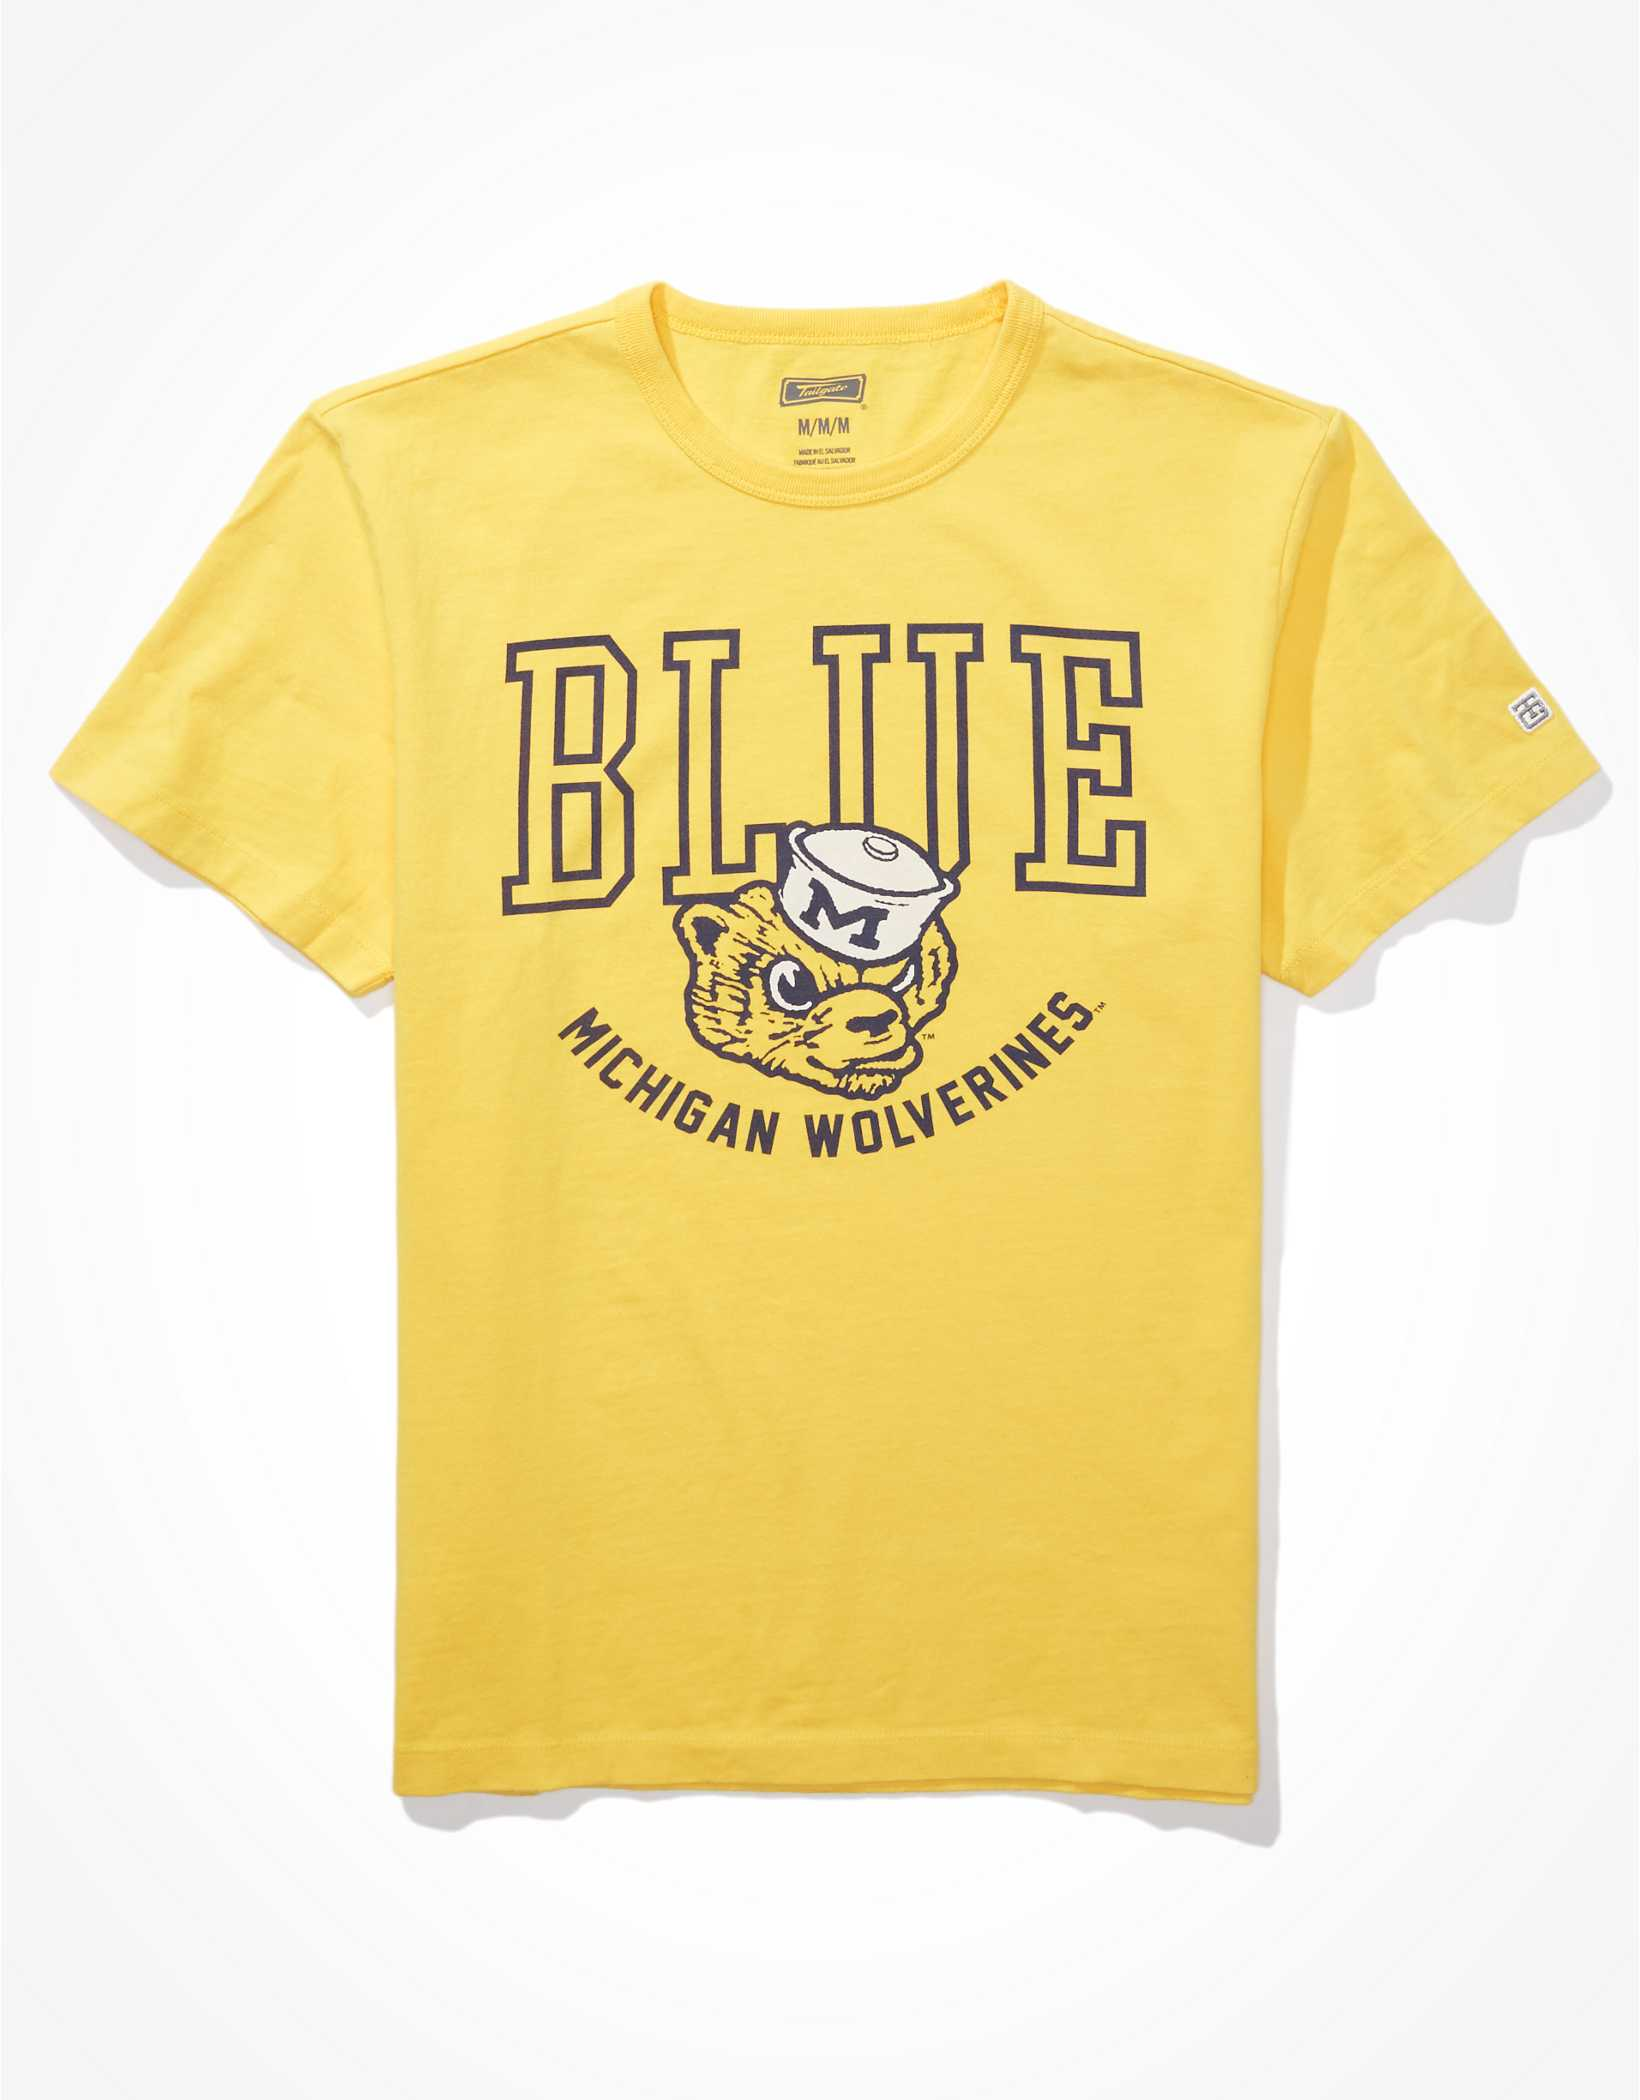 Tailgate Men's Michigan Wolverines Graphic T-Shirt